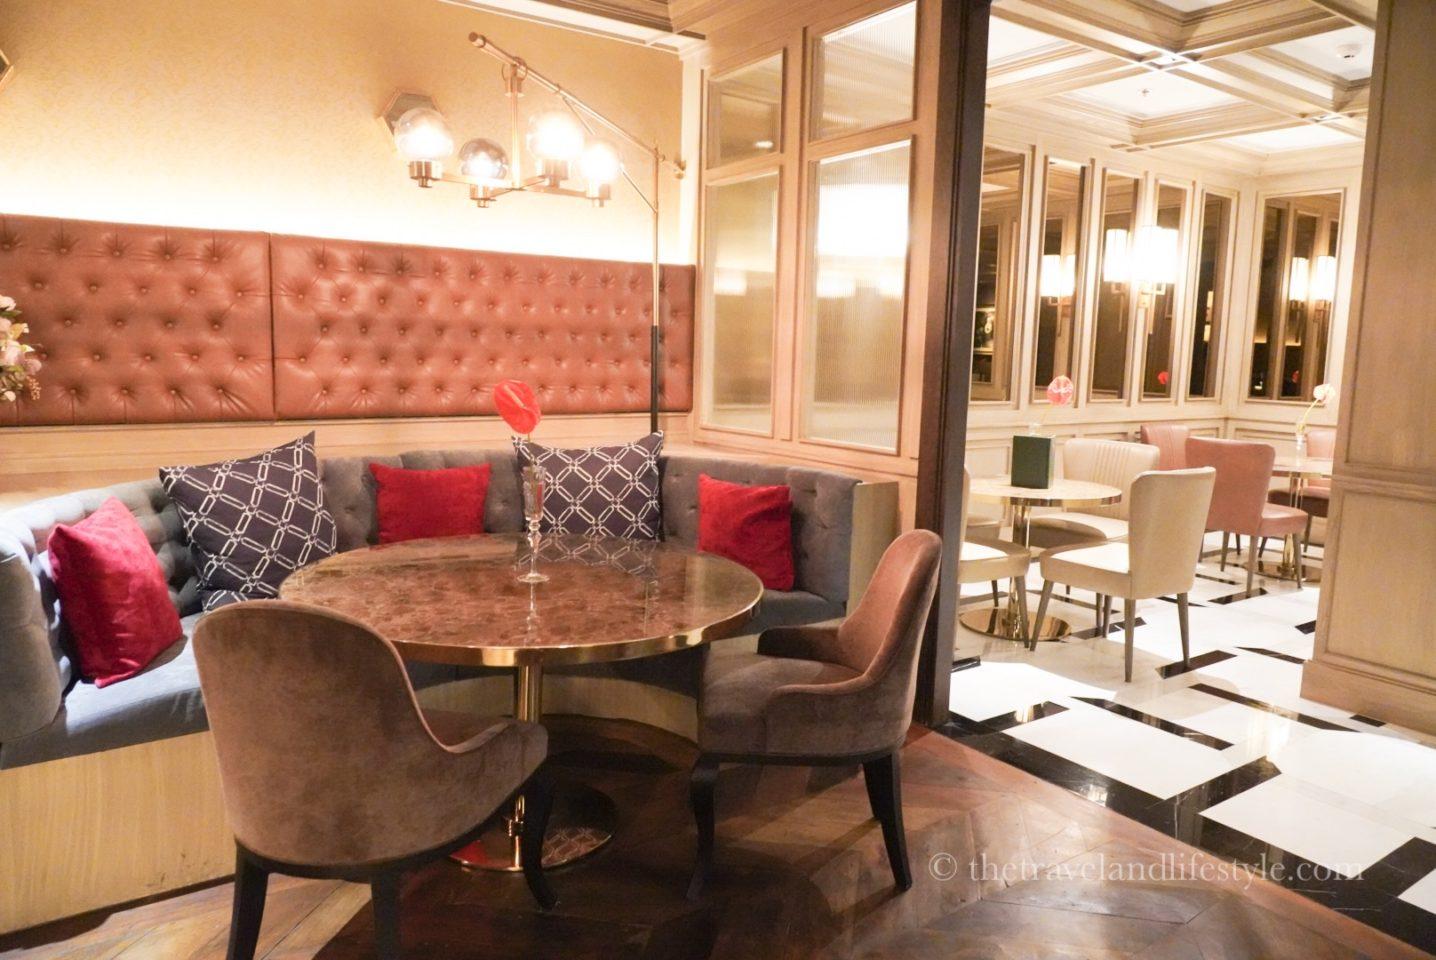 dsc08602 - akyra Thonglor Bangkok -  バンコクのラグジュアリーデザイナーズホテル